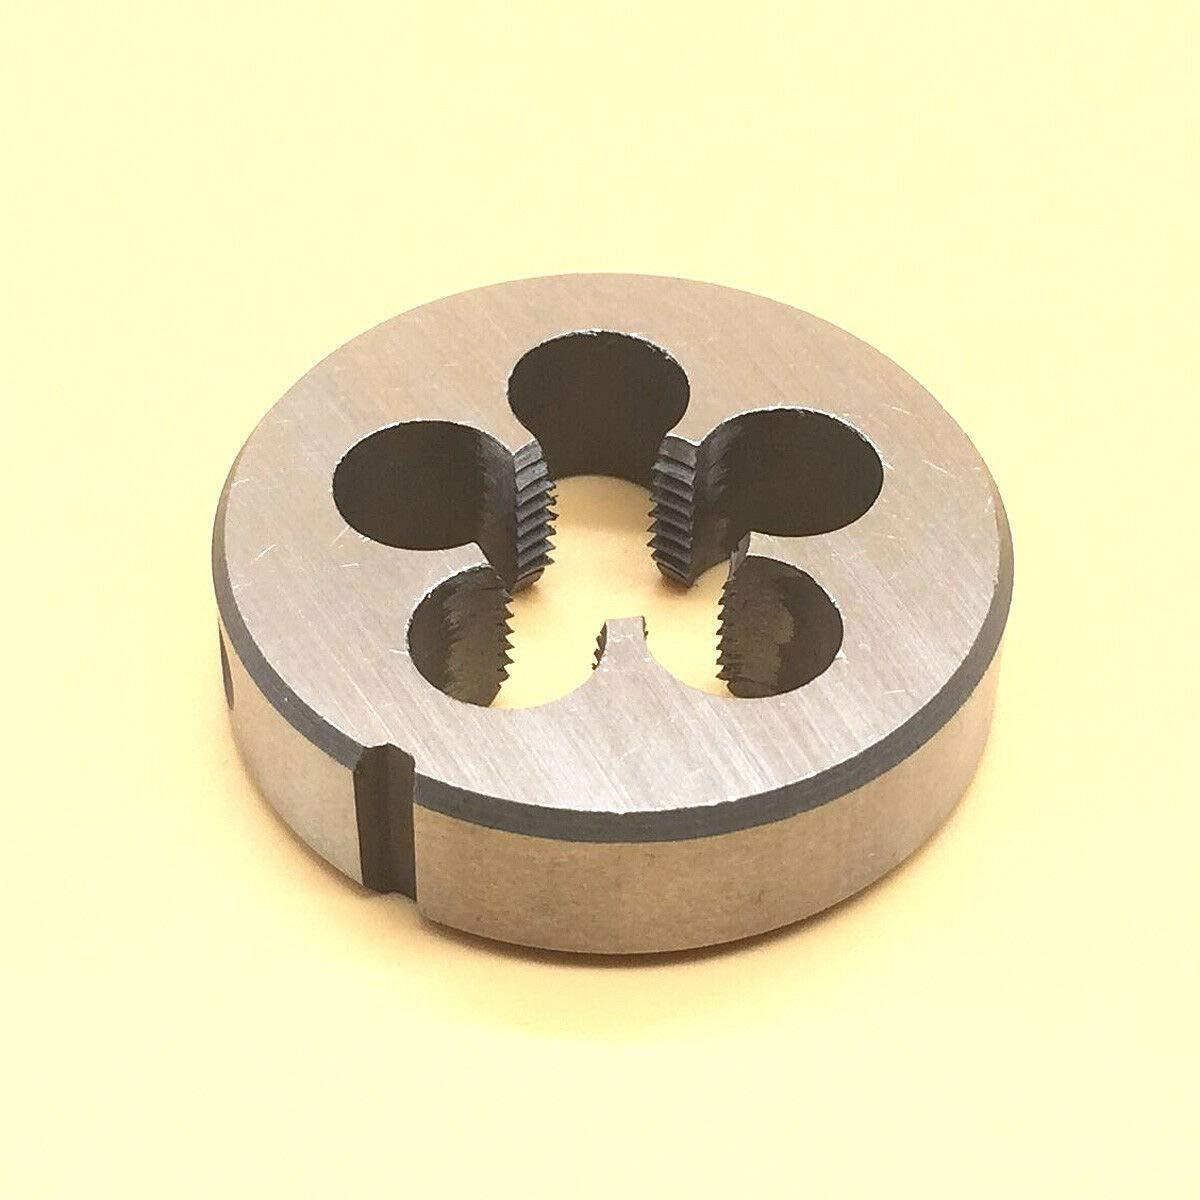 FidgetKute 1//2-24 Right Hand Thread Die 1//2-24 TPI CAPT2012